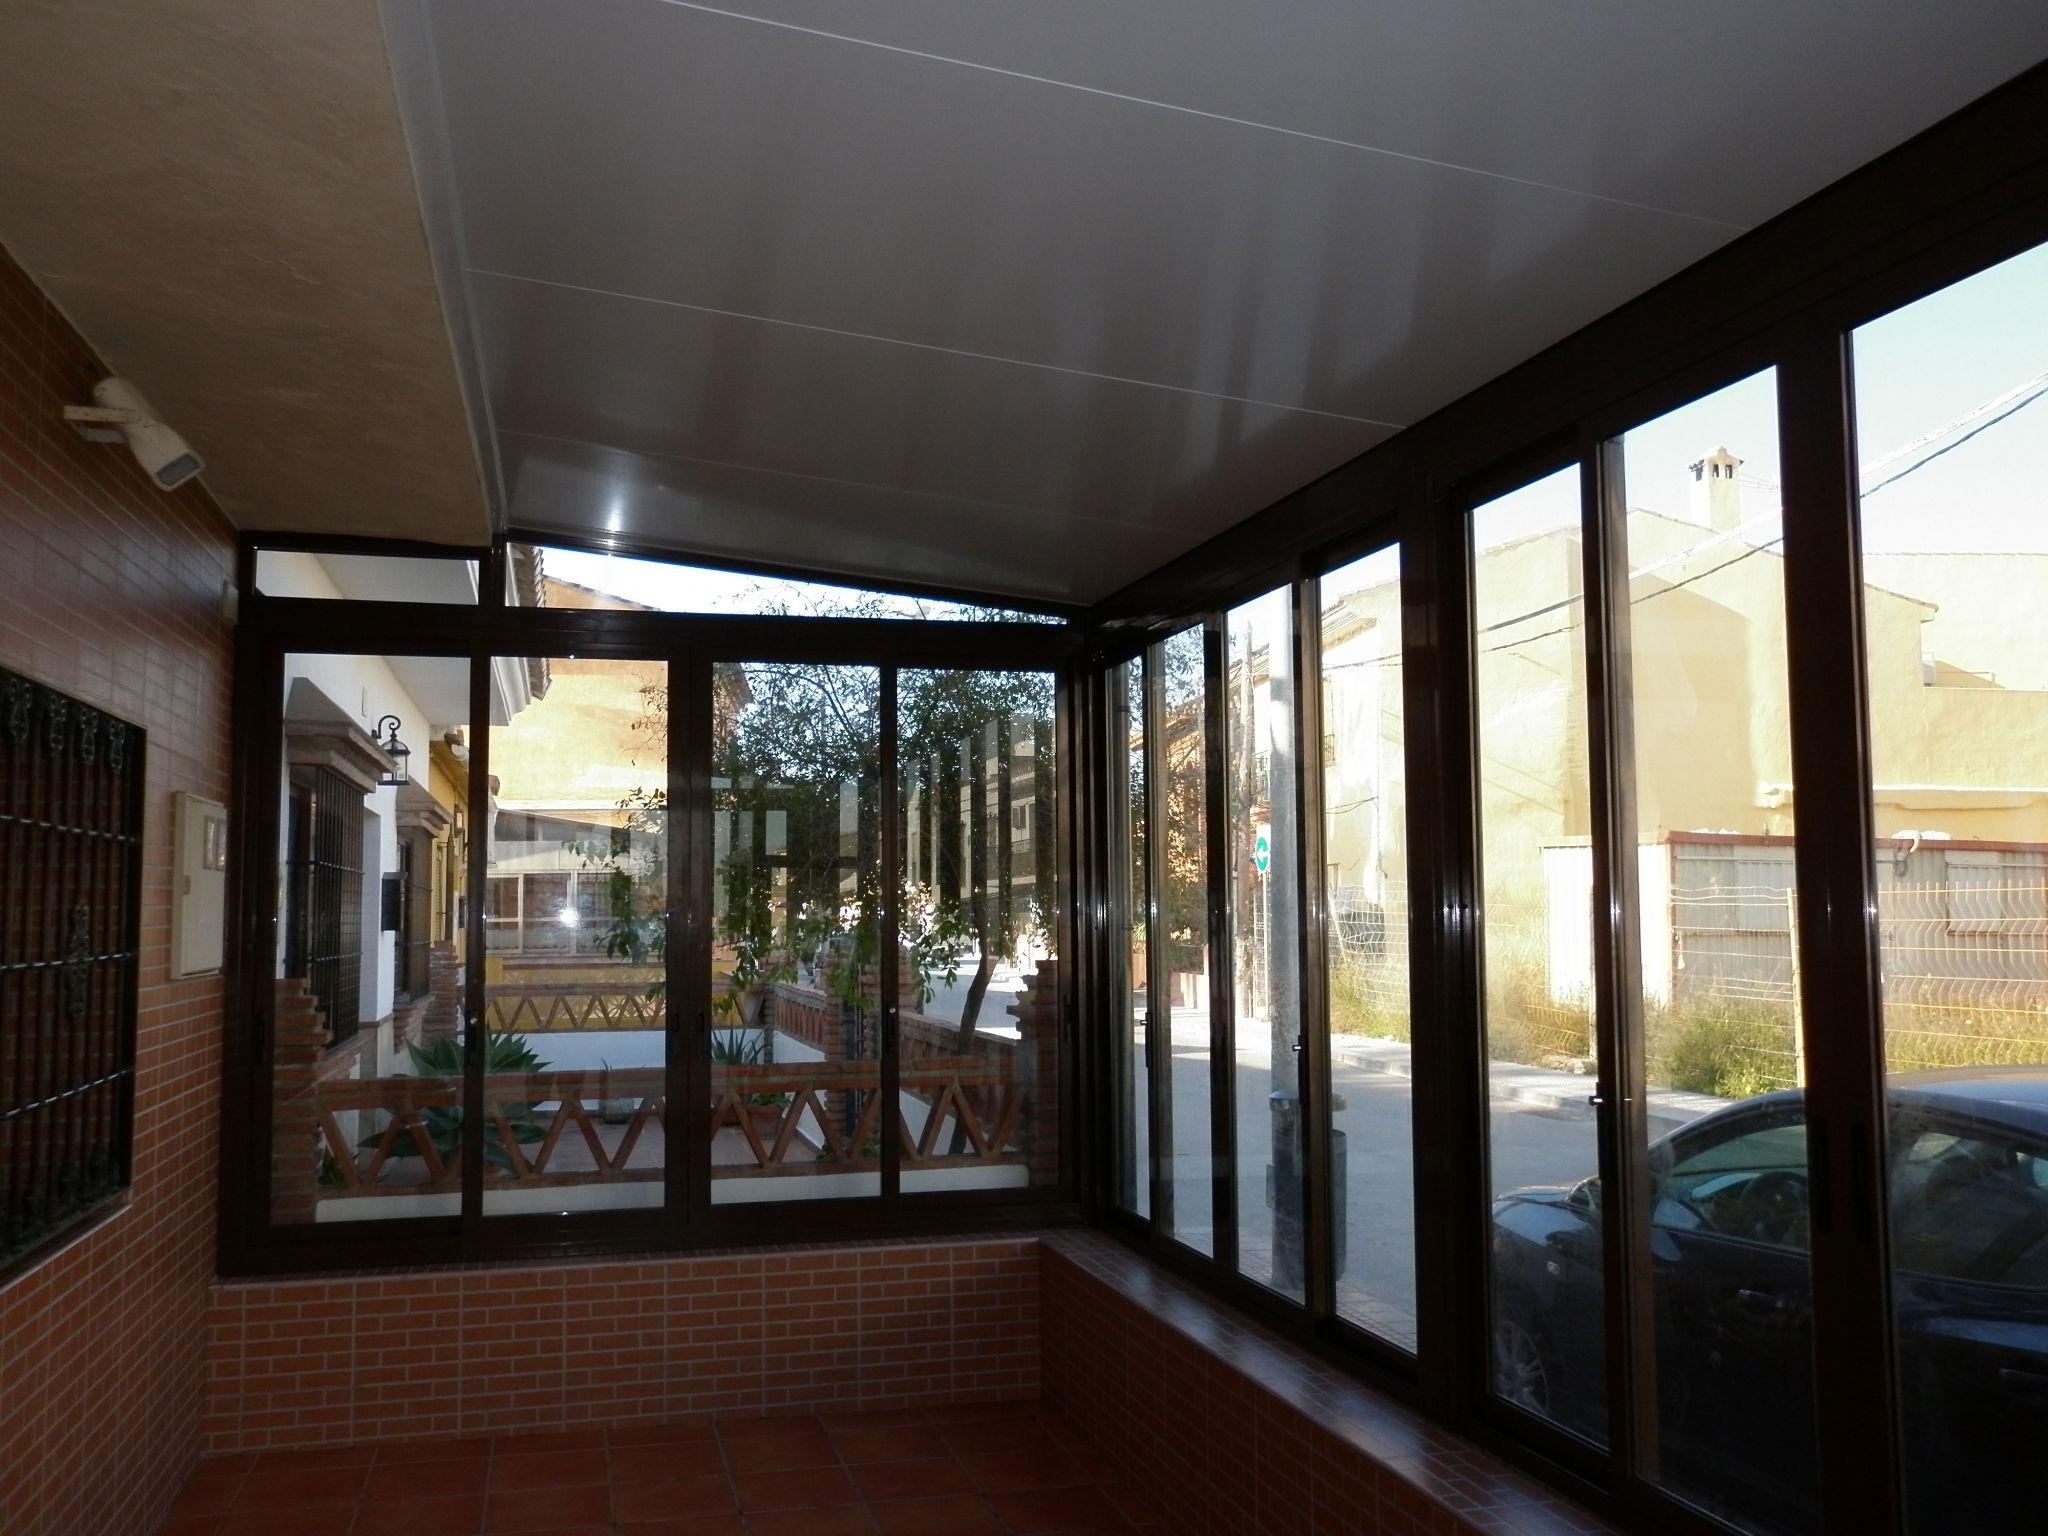 Foto 28 de Carpintería de aluminio, metálica y PVC en Málaga | Aluminios Alunoe